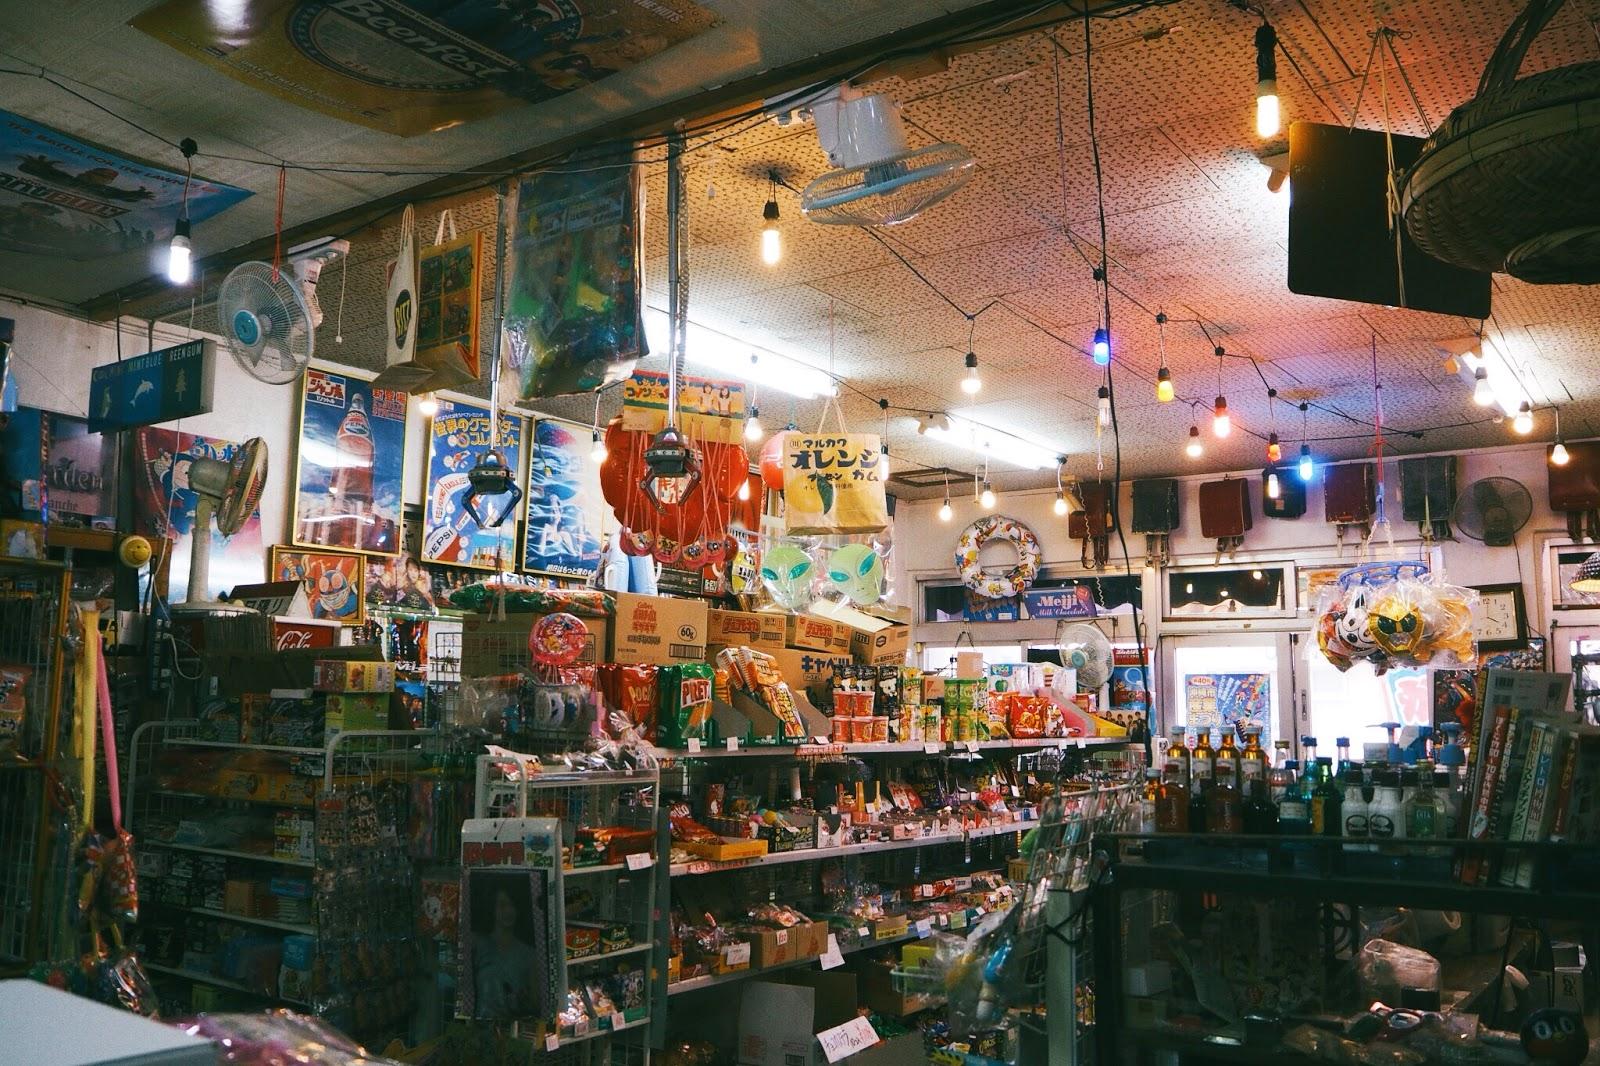 uruma store, okinawa, japan, photography, olympus pen e-pl 7, karen okuda, konichiwakaren, elashock, dagashiya